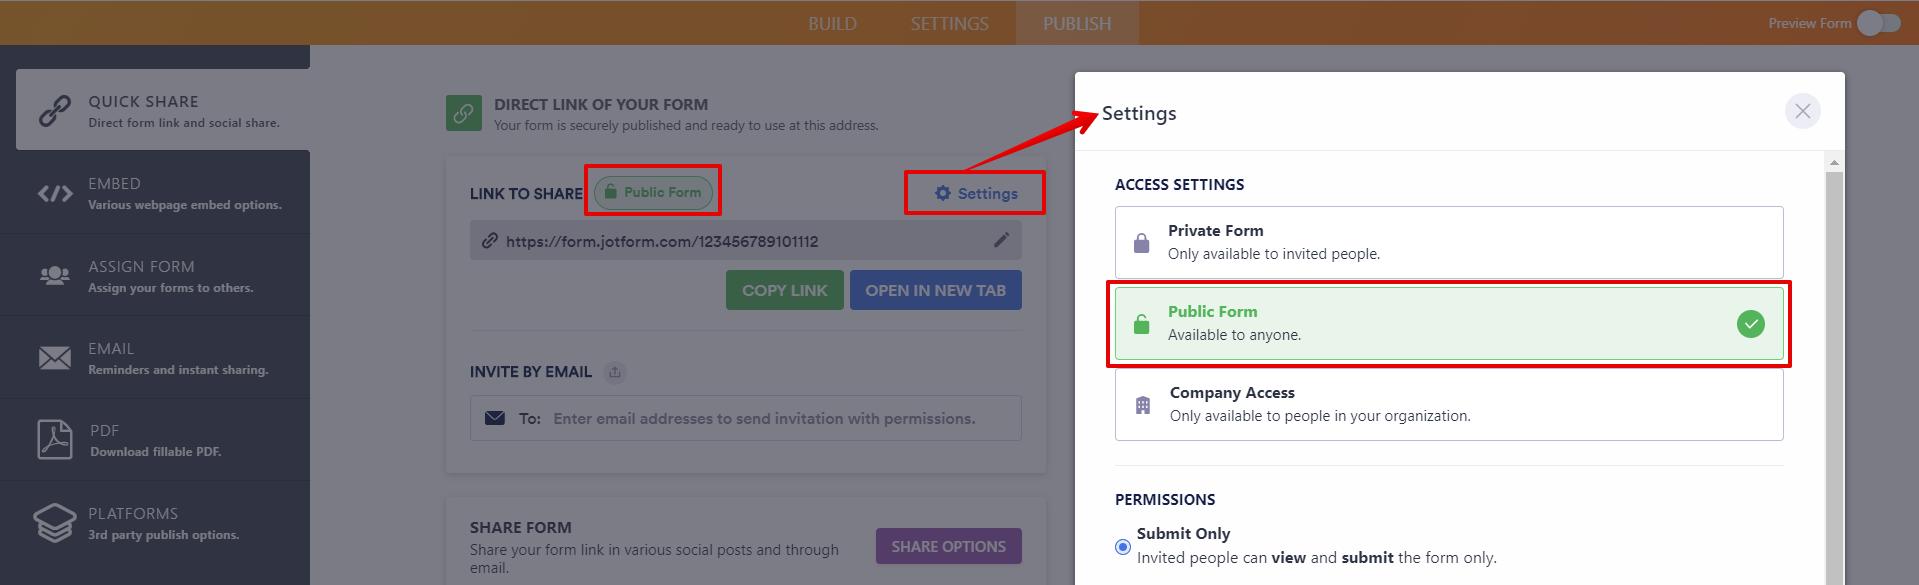 access-settings-public-link.png